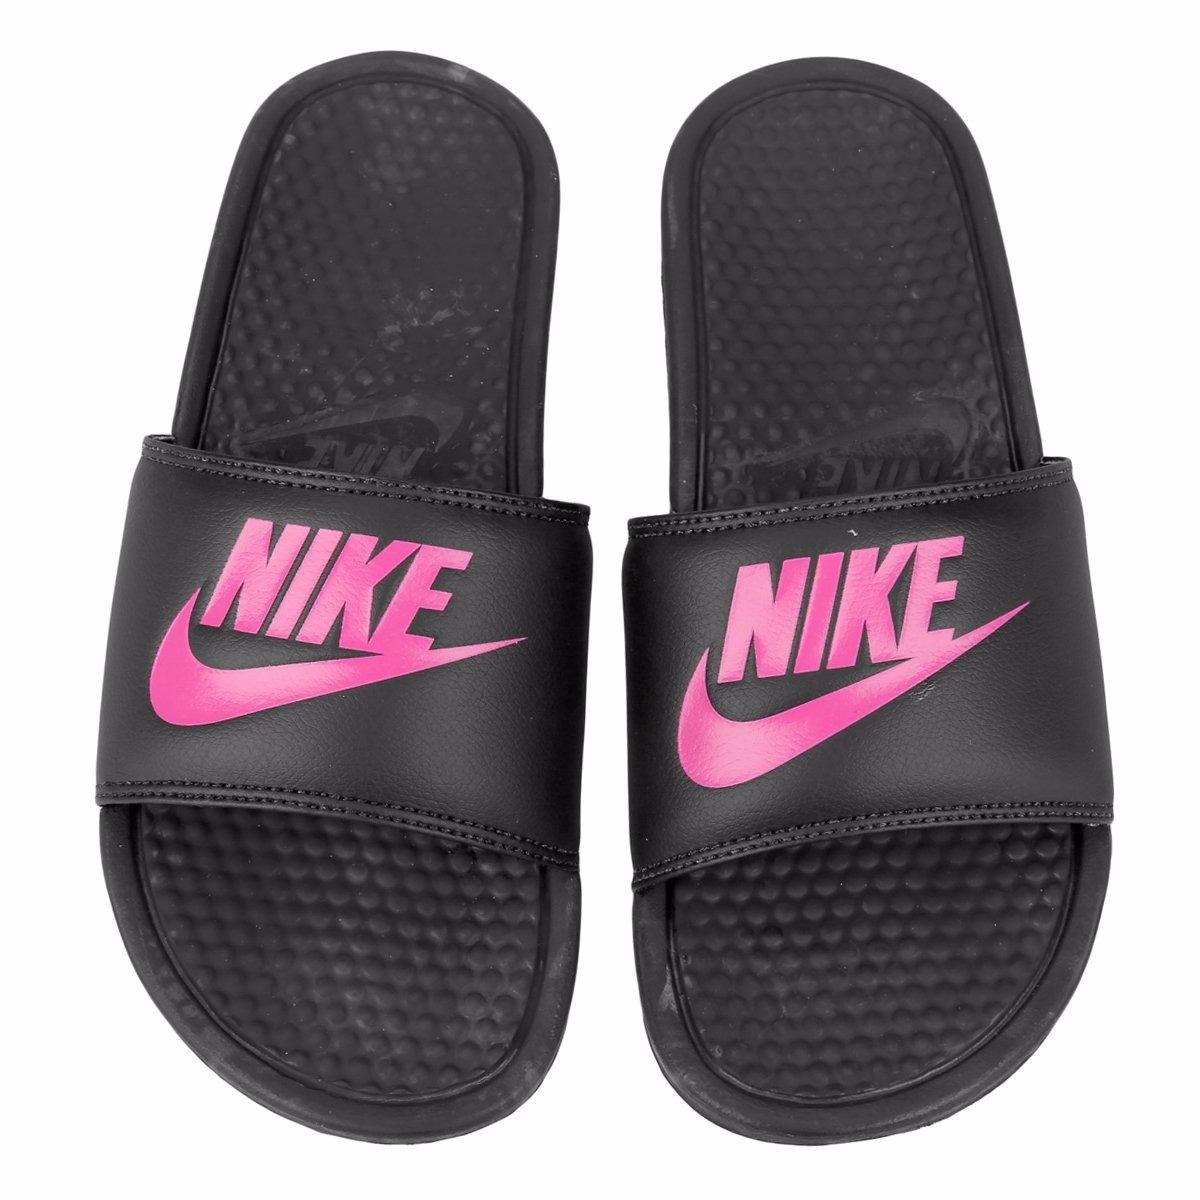 Ojotas Nike Sb Ojotas Nuevo Benassi Negro Rosa Hombre Mujer Nuevo Ojotas 950 558fa2